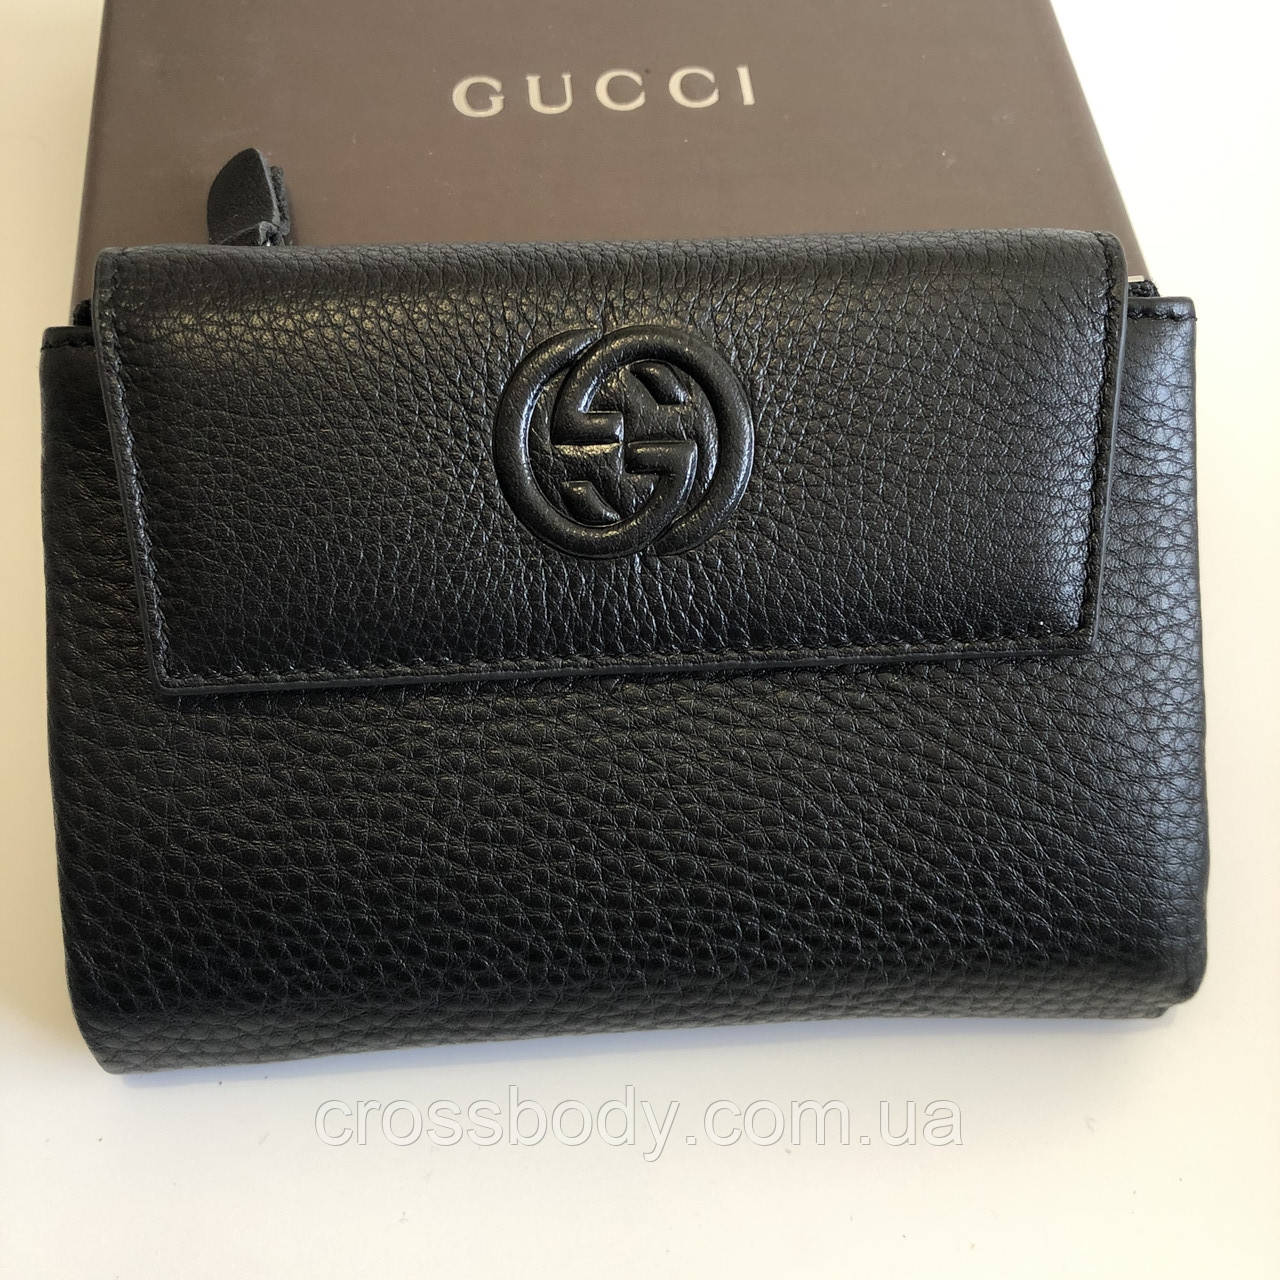 Женский кошелек кожа Gucci  056B-A